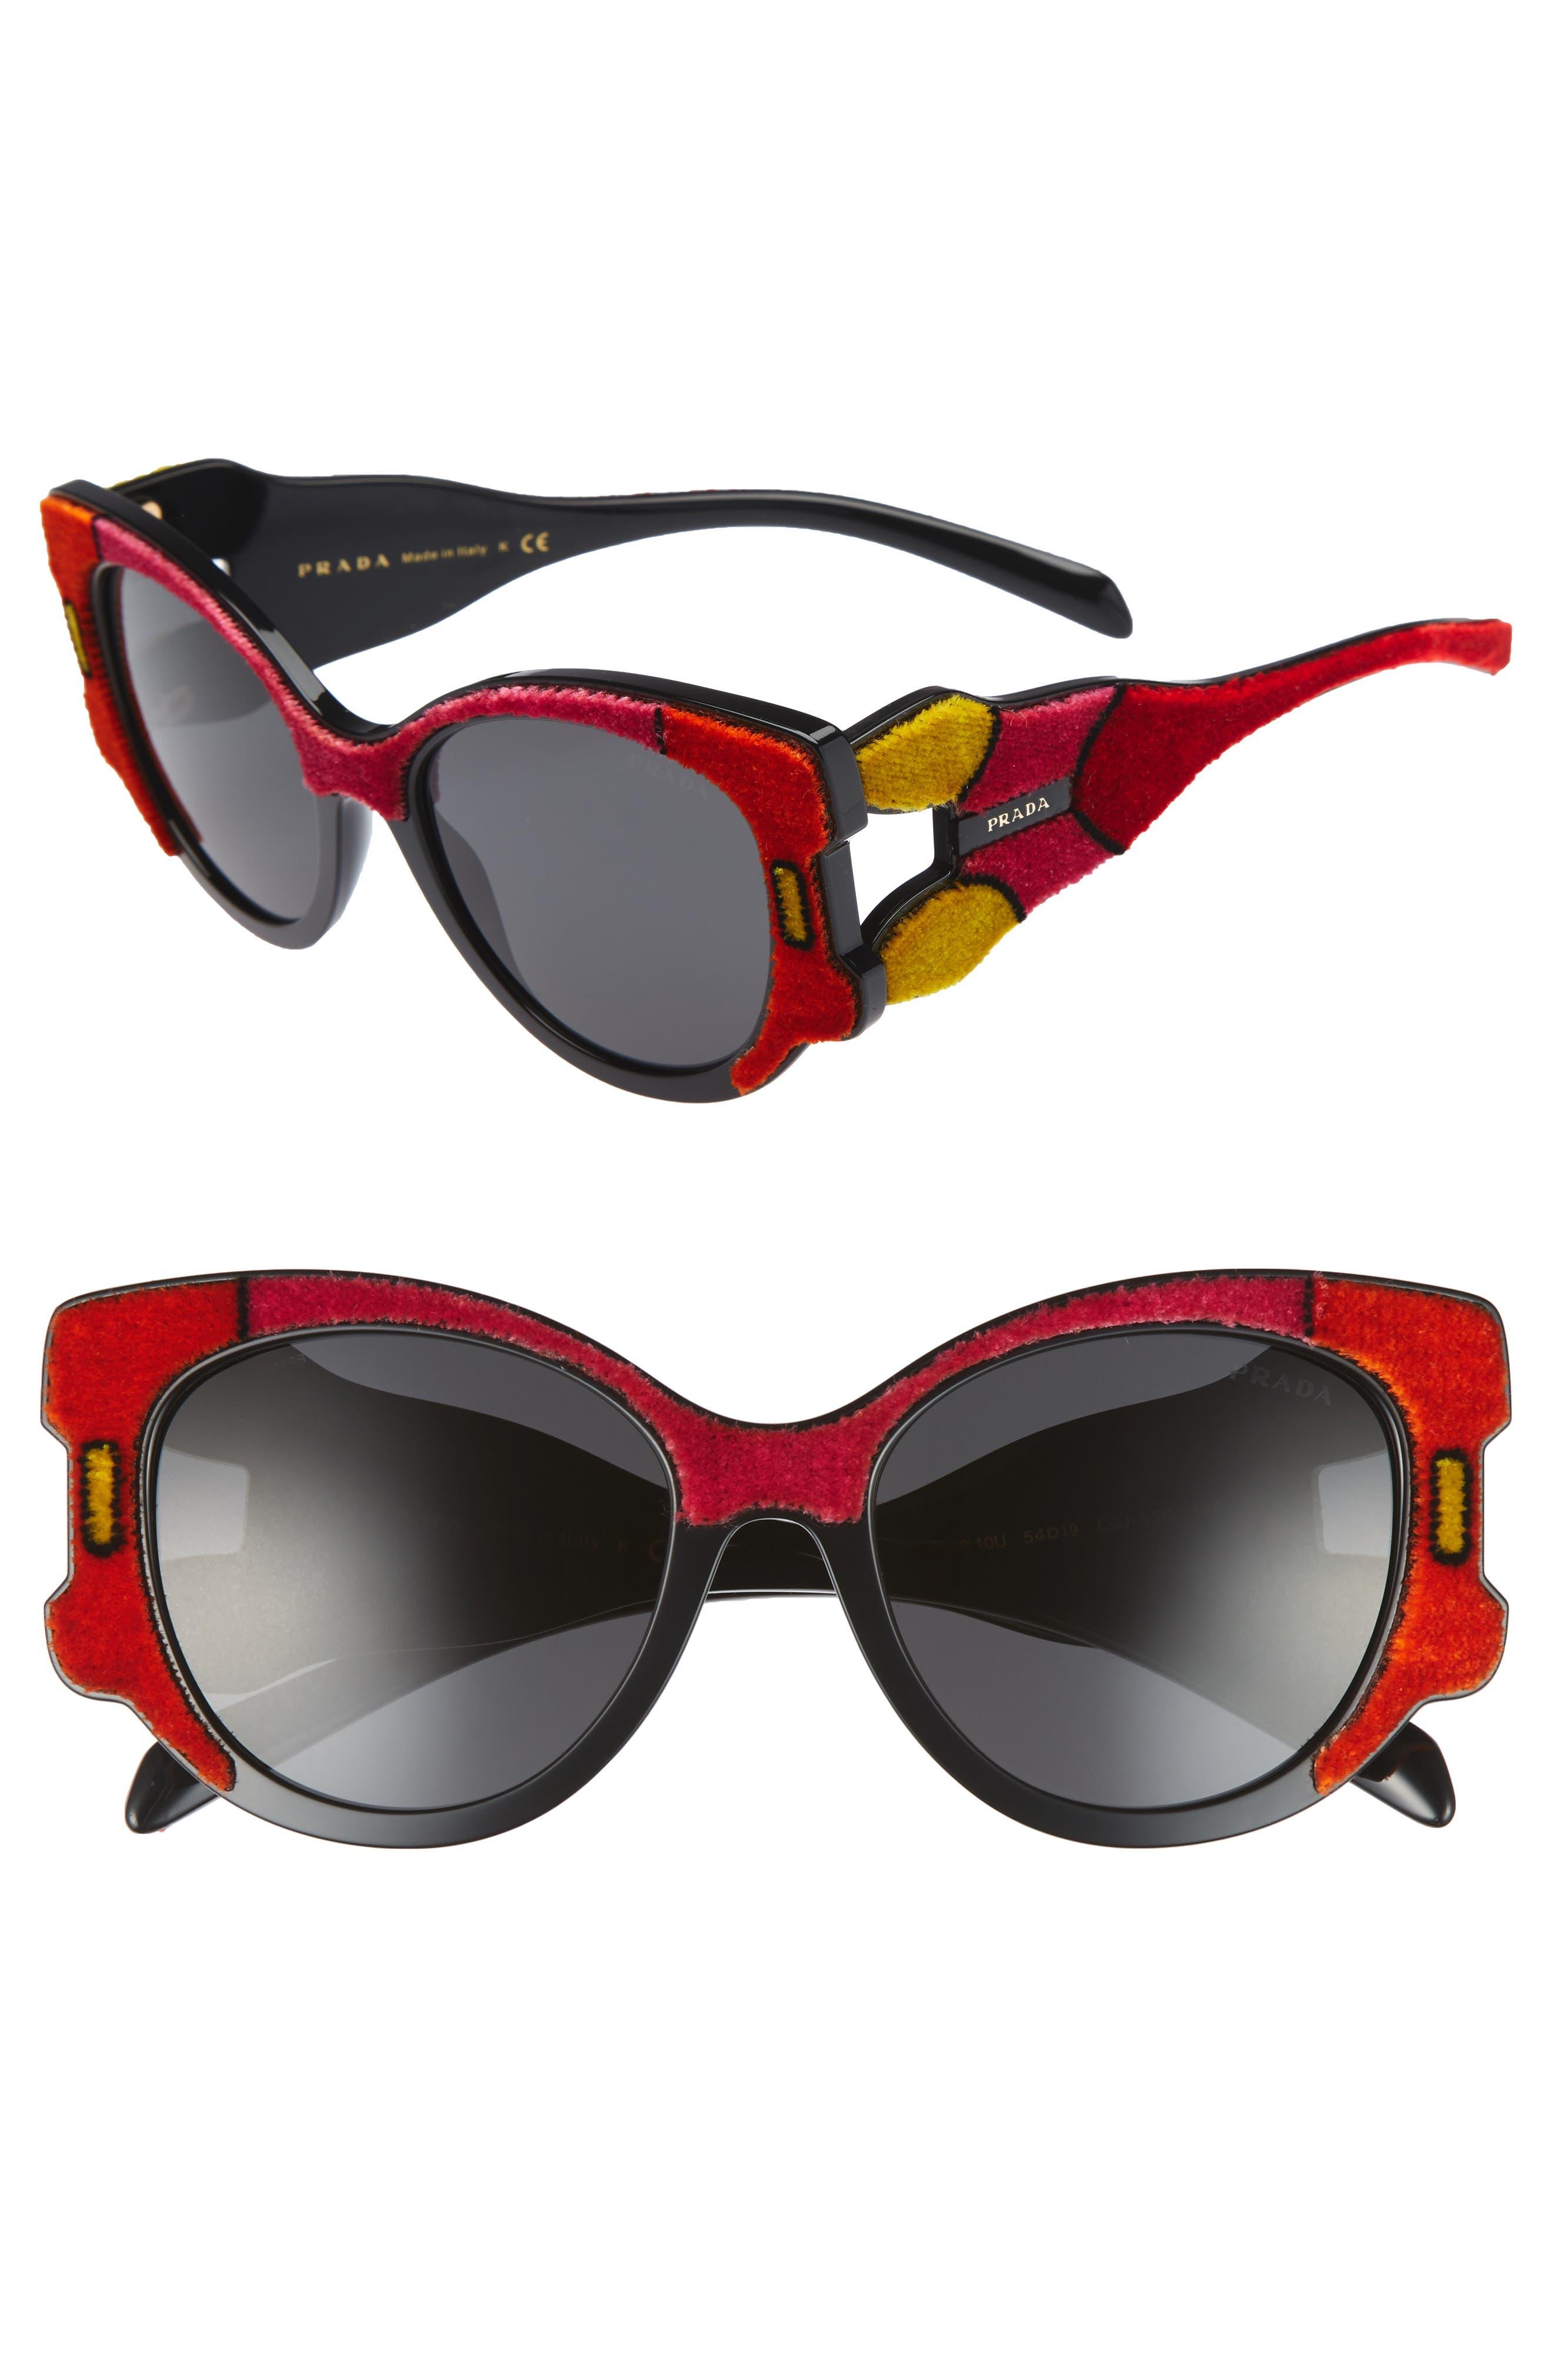 54mm Colorblock Round Sunglasses,                             Main thumbnail 1, color,                             010